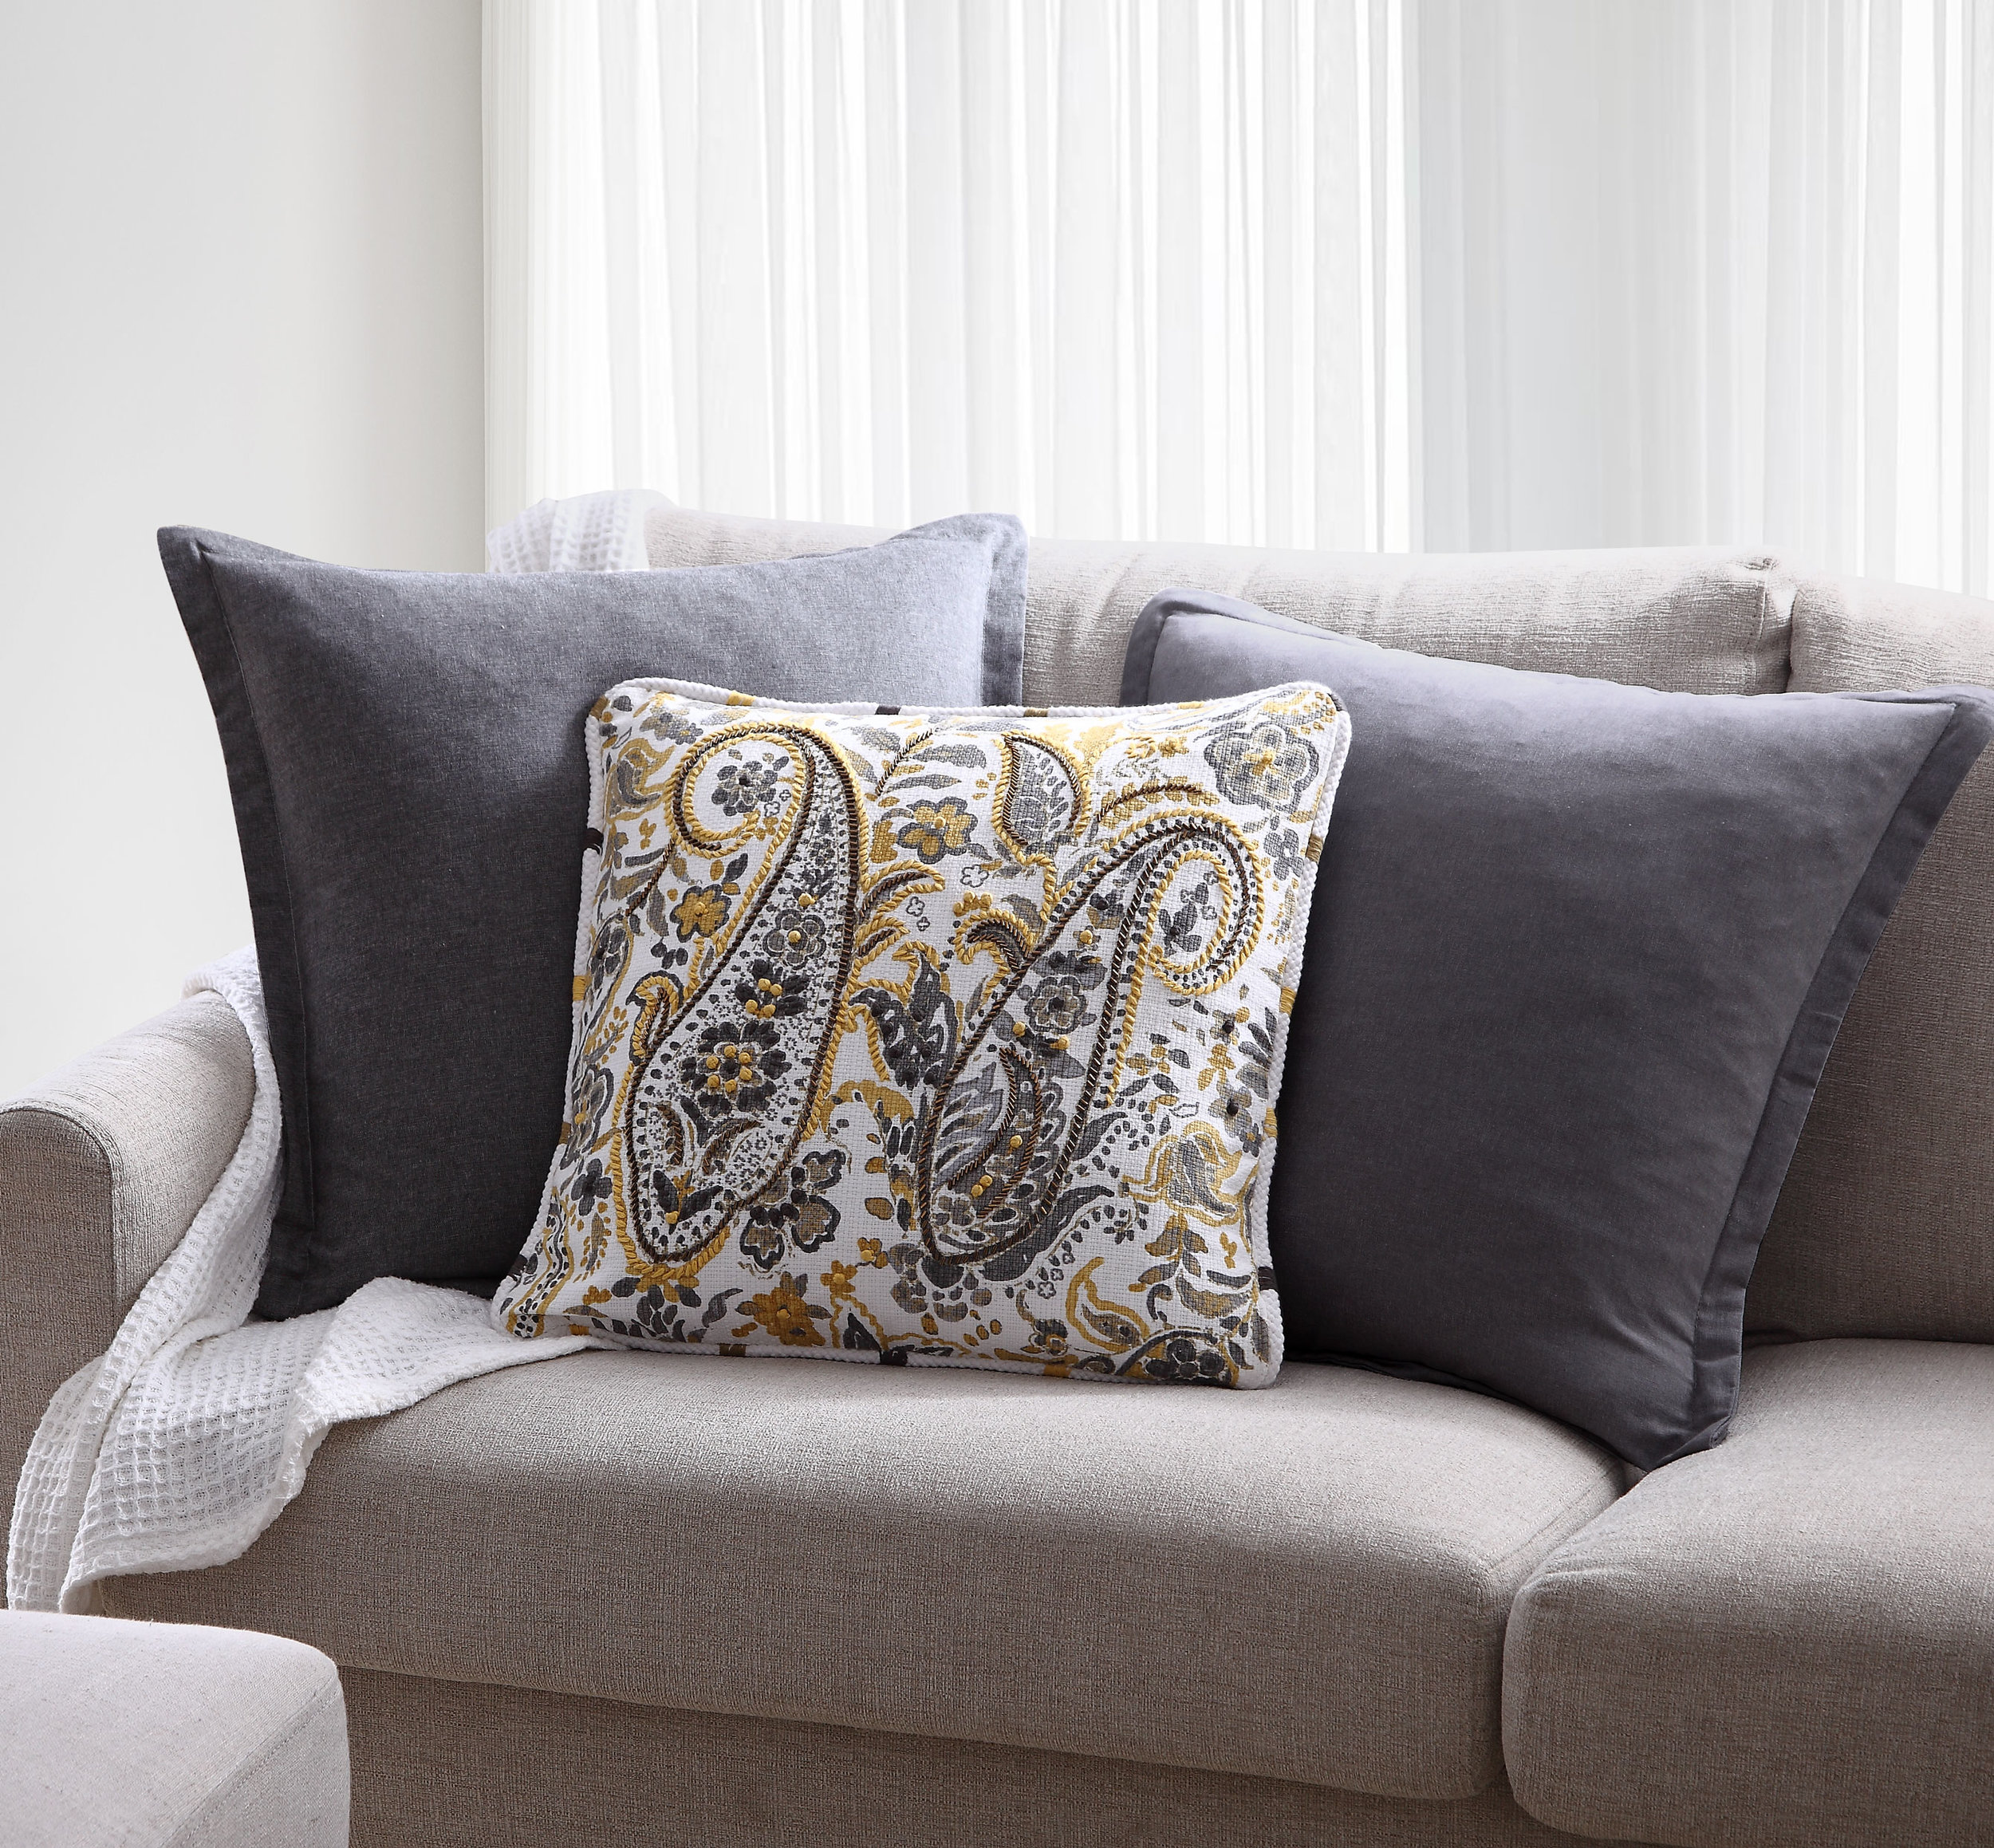 B0102024-Lifestyle-Pillow-4.jpg